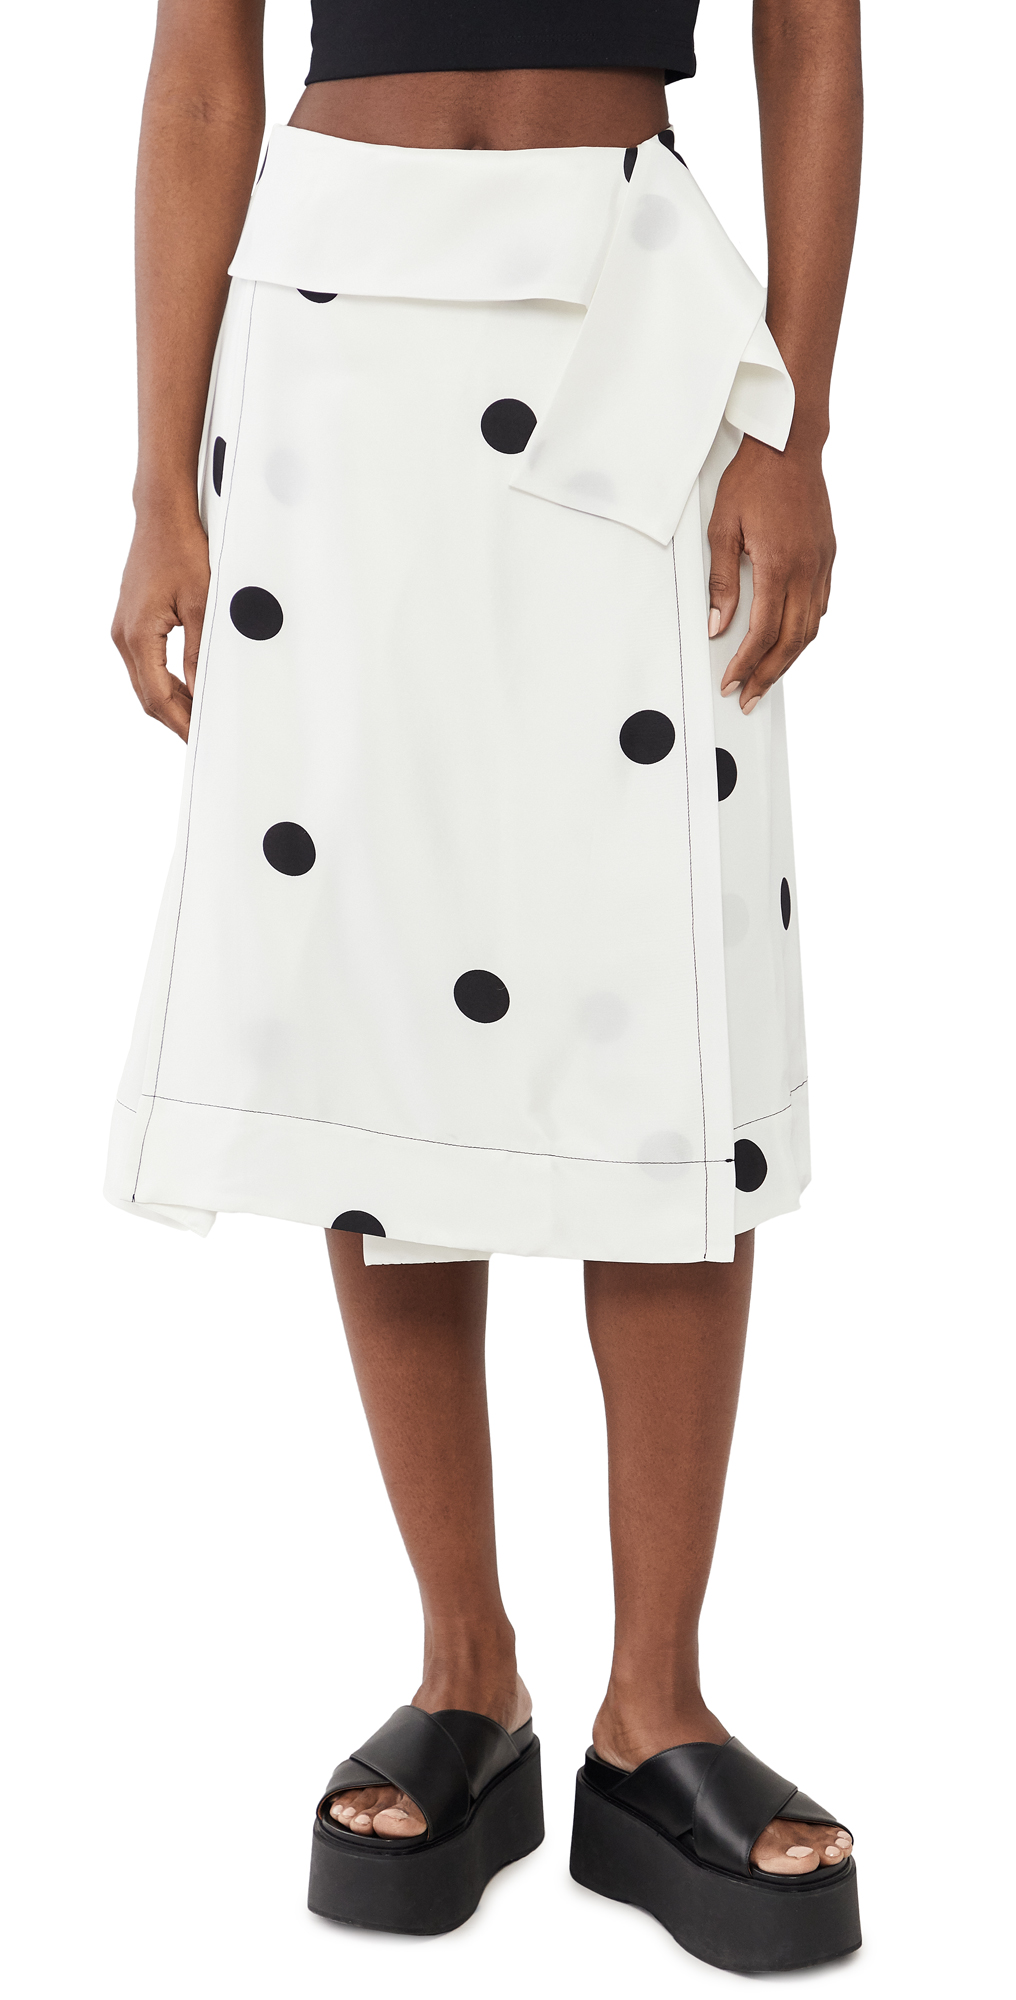 3.1 Phillip Lim Dot Print Drape Band Skirt